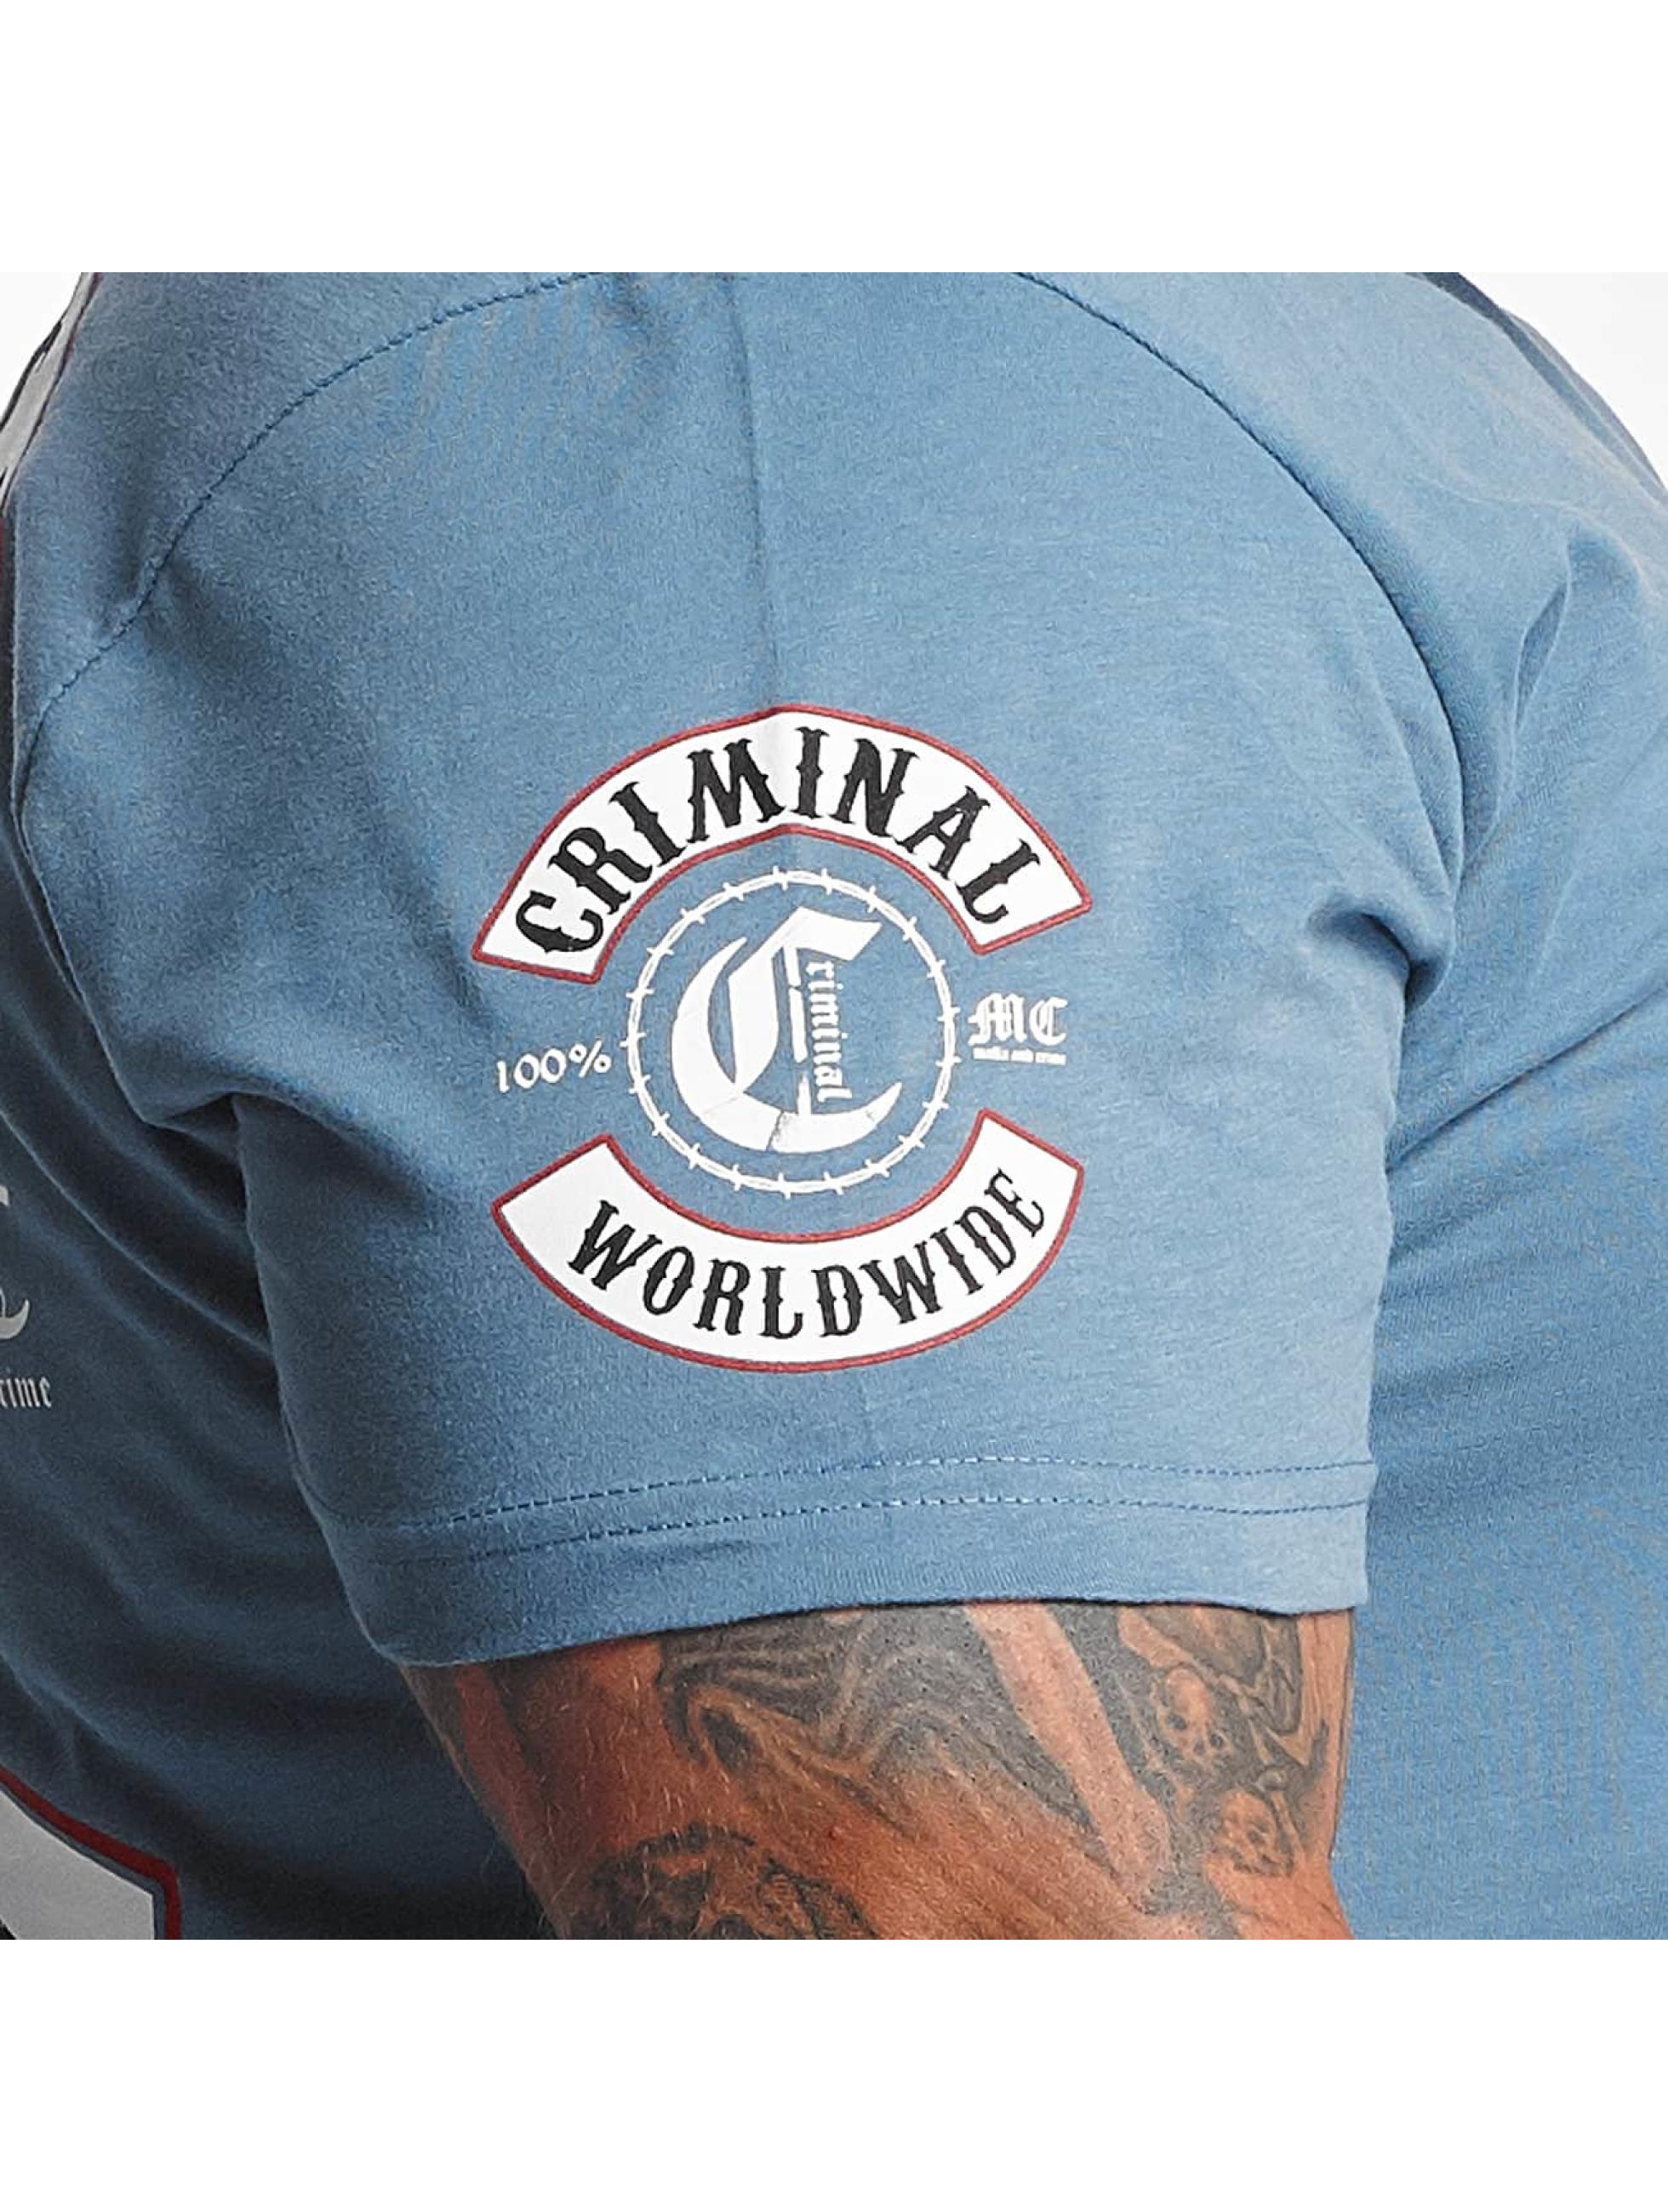 Mafia & Crime T-Shirt Criminal Worldwide blau